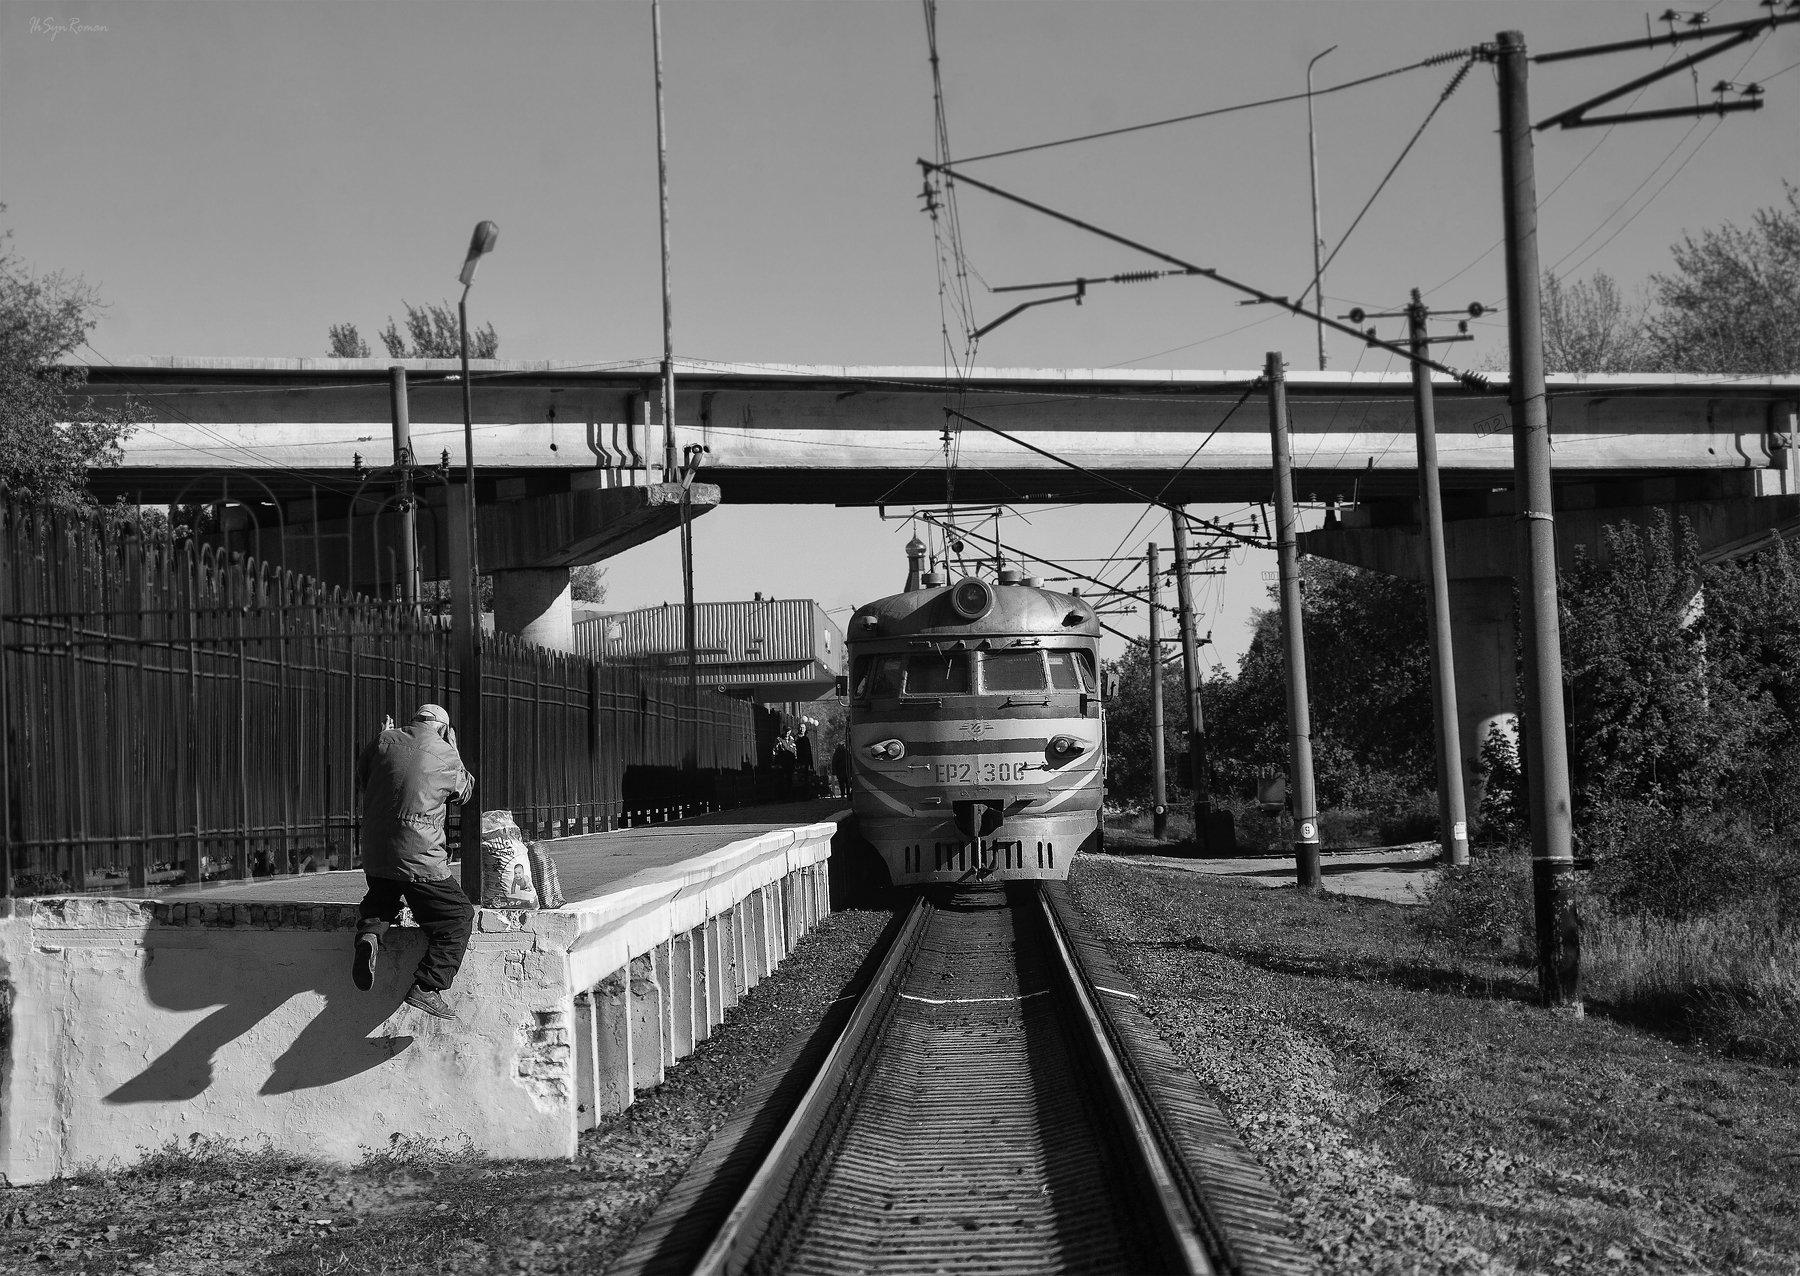 город, улица, станция, железная дорога, электричка, пассажир, Roma  Chitinskiy